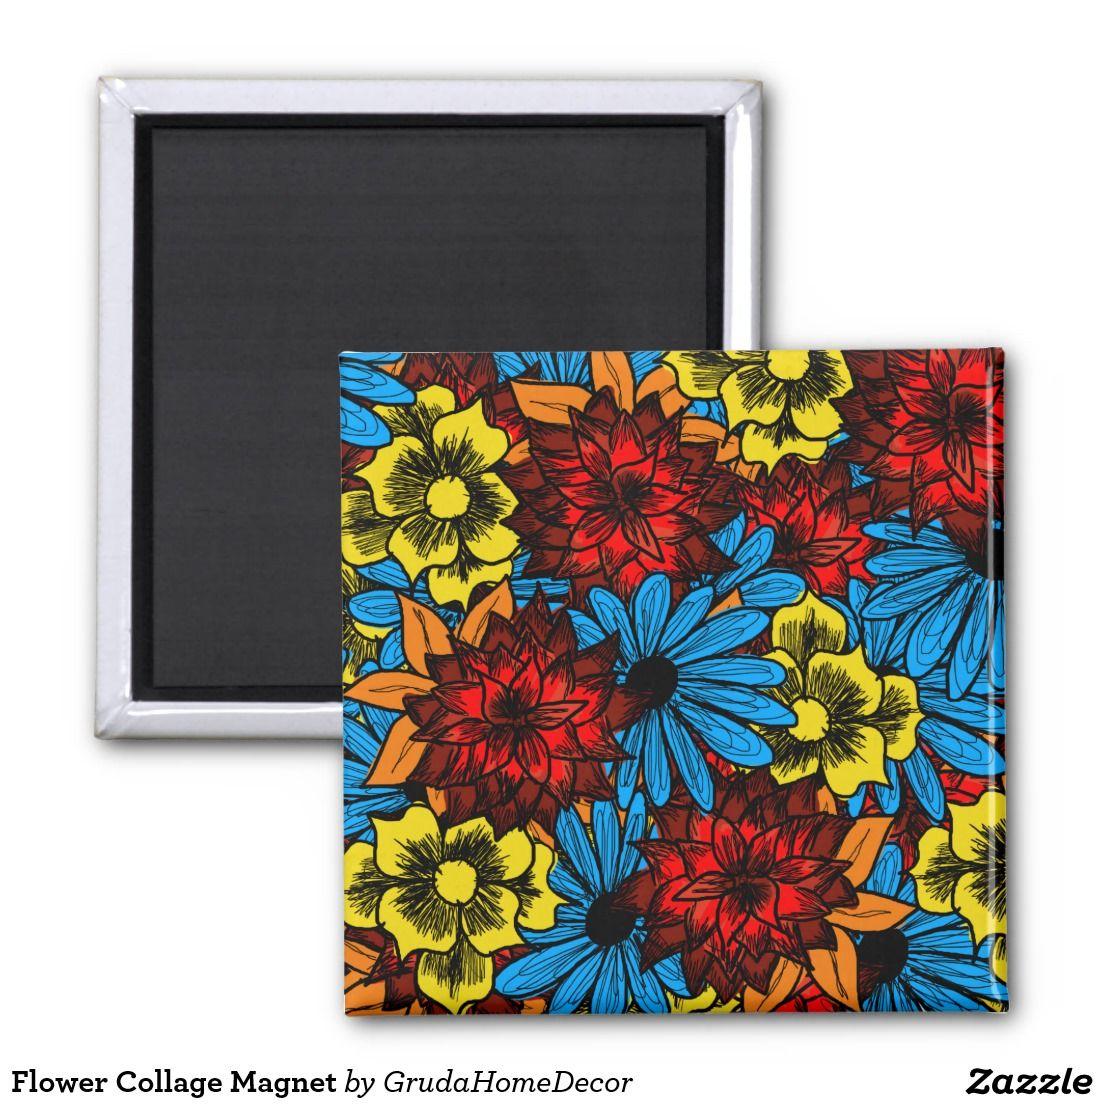 Flower Collage Magnet